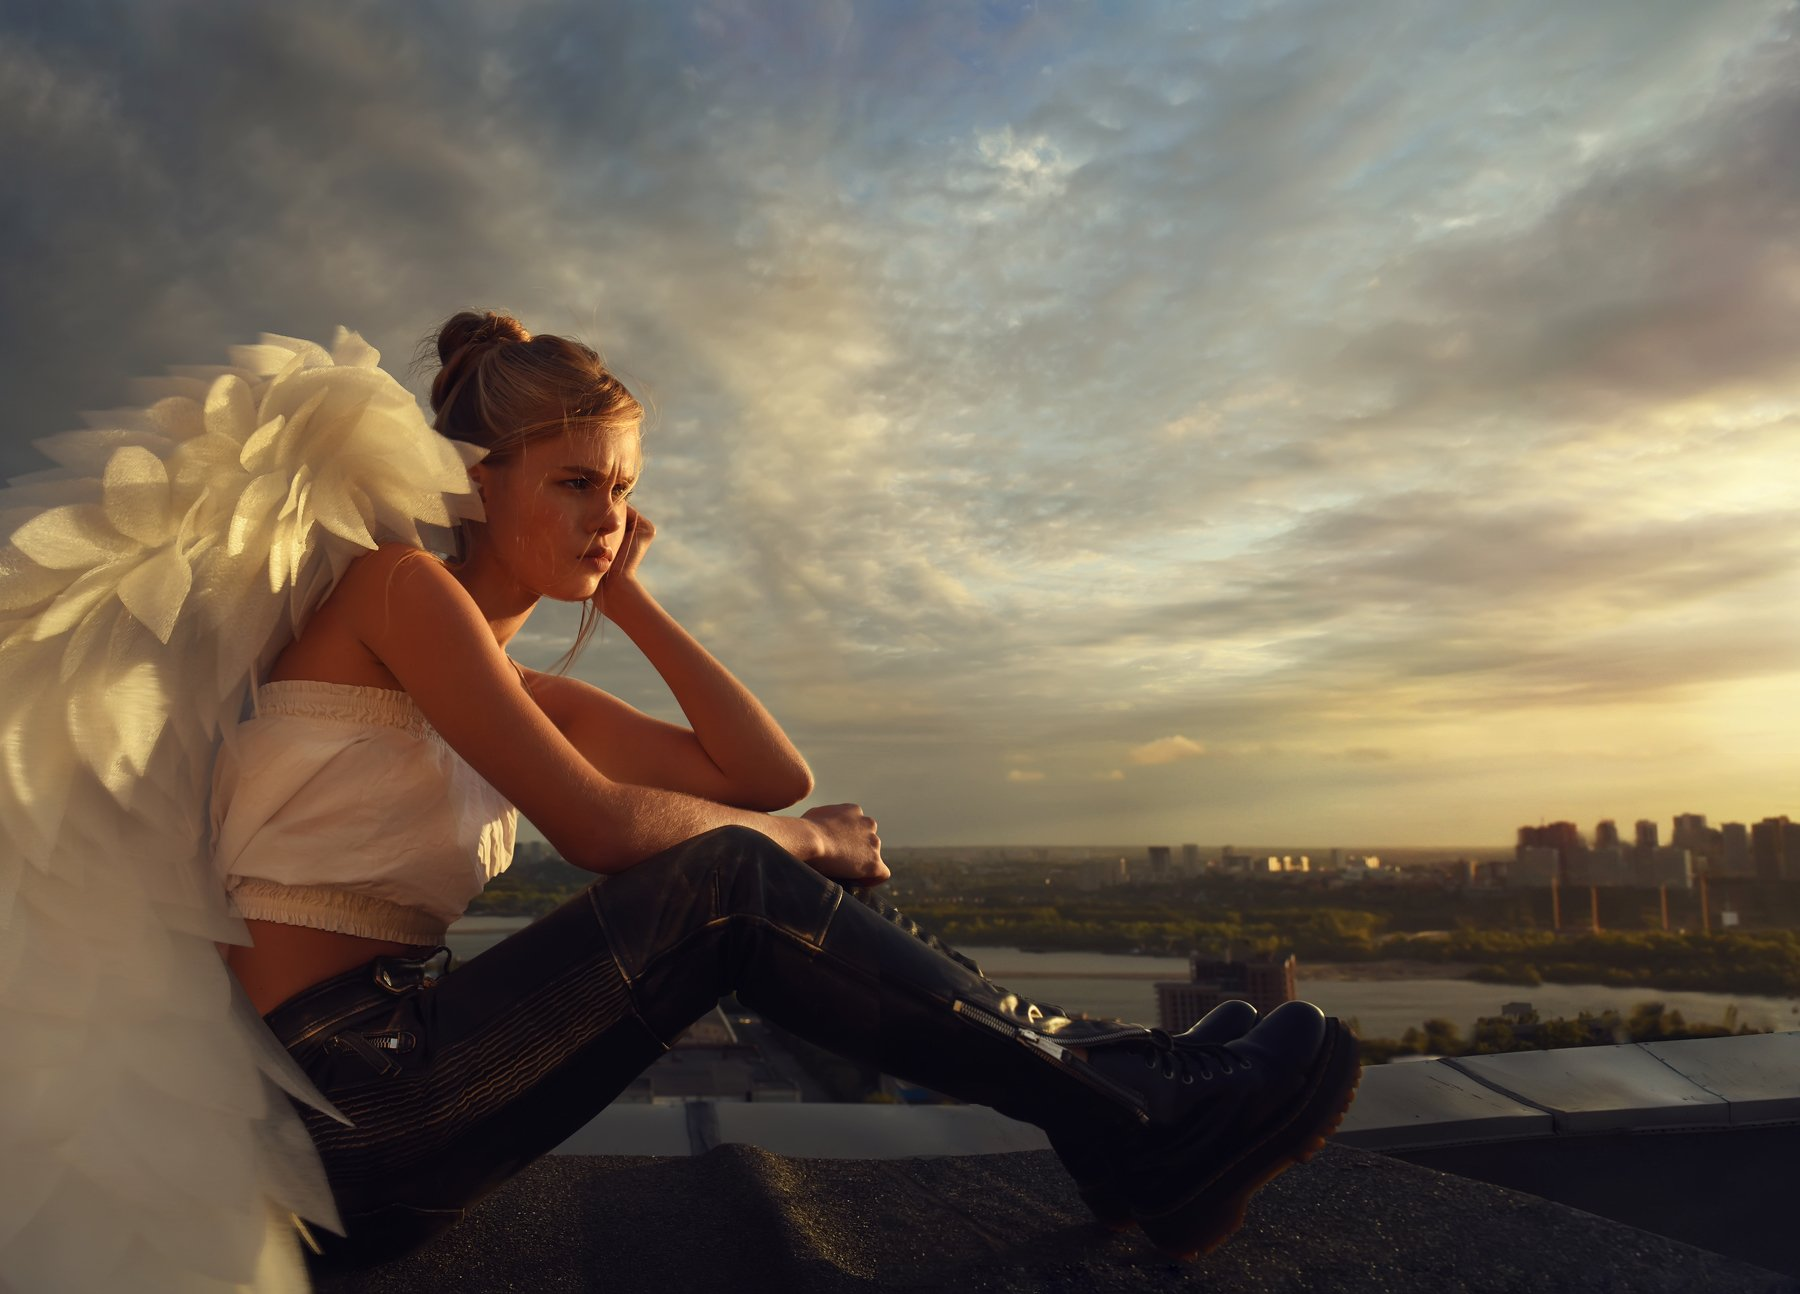 #love #angels #amour #sky #child #girl #boy #gun #beretta #ангелы #крыша #myths #ancient #beauté #photographyart #rooftop #rooftops #roofing  #photostory #love #conceptualphotography #art #photoart #anges #conceptual, Olli Ogneva